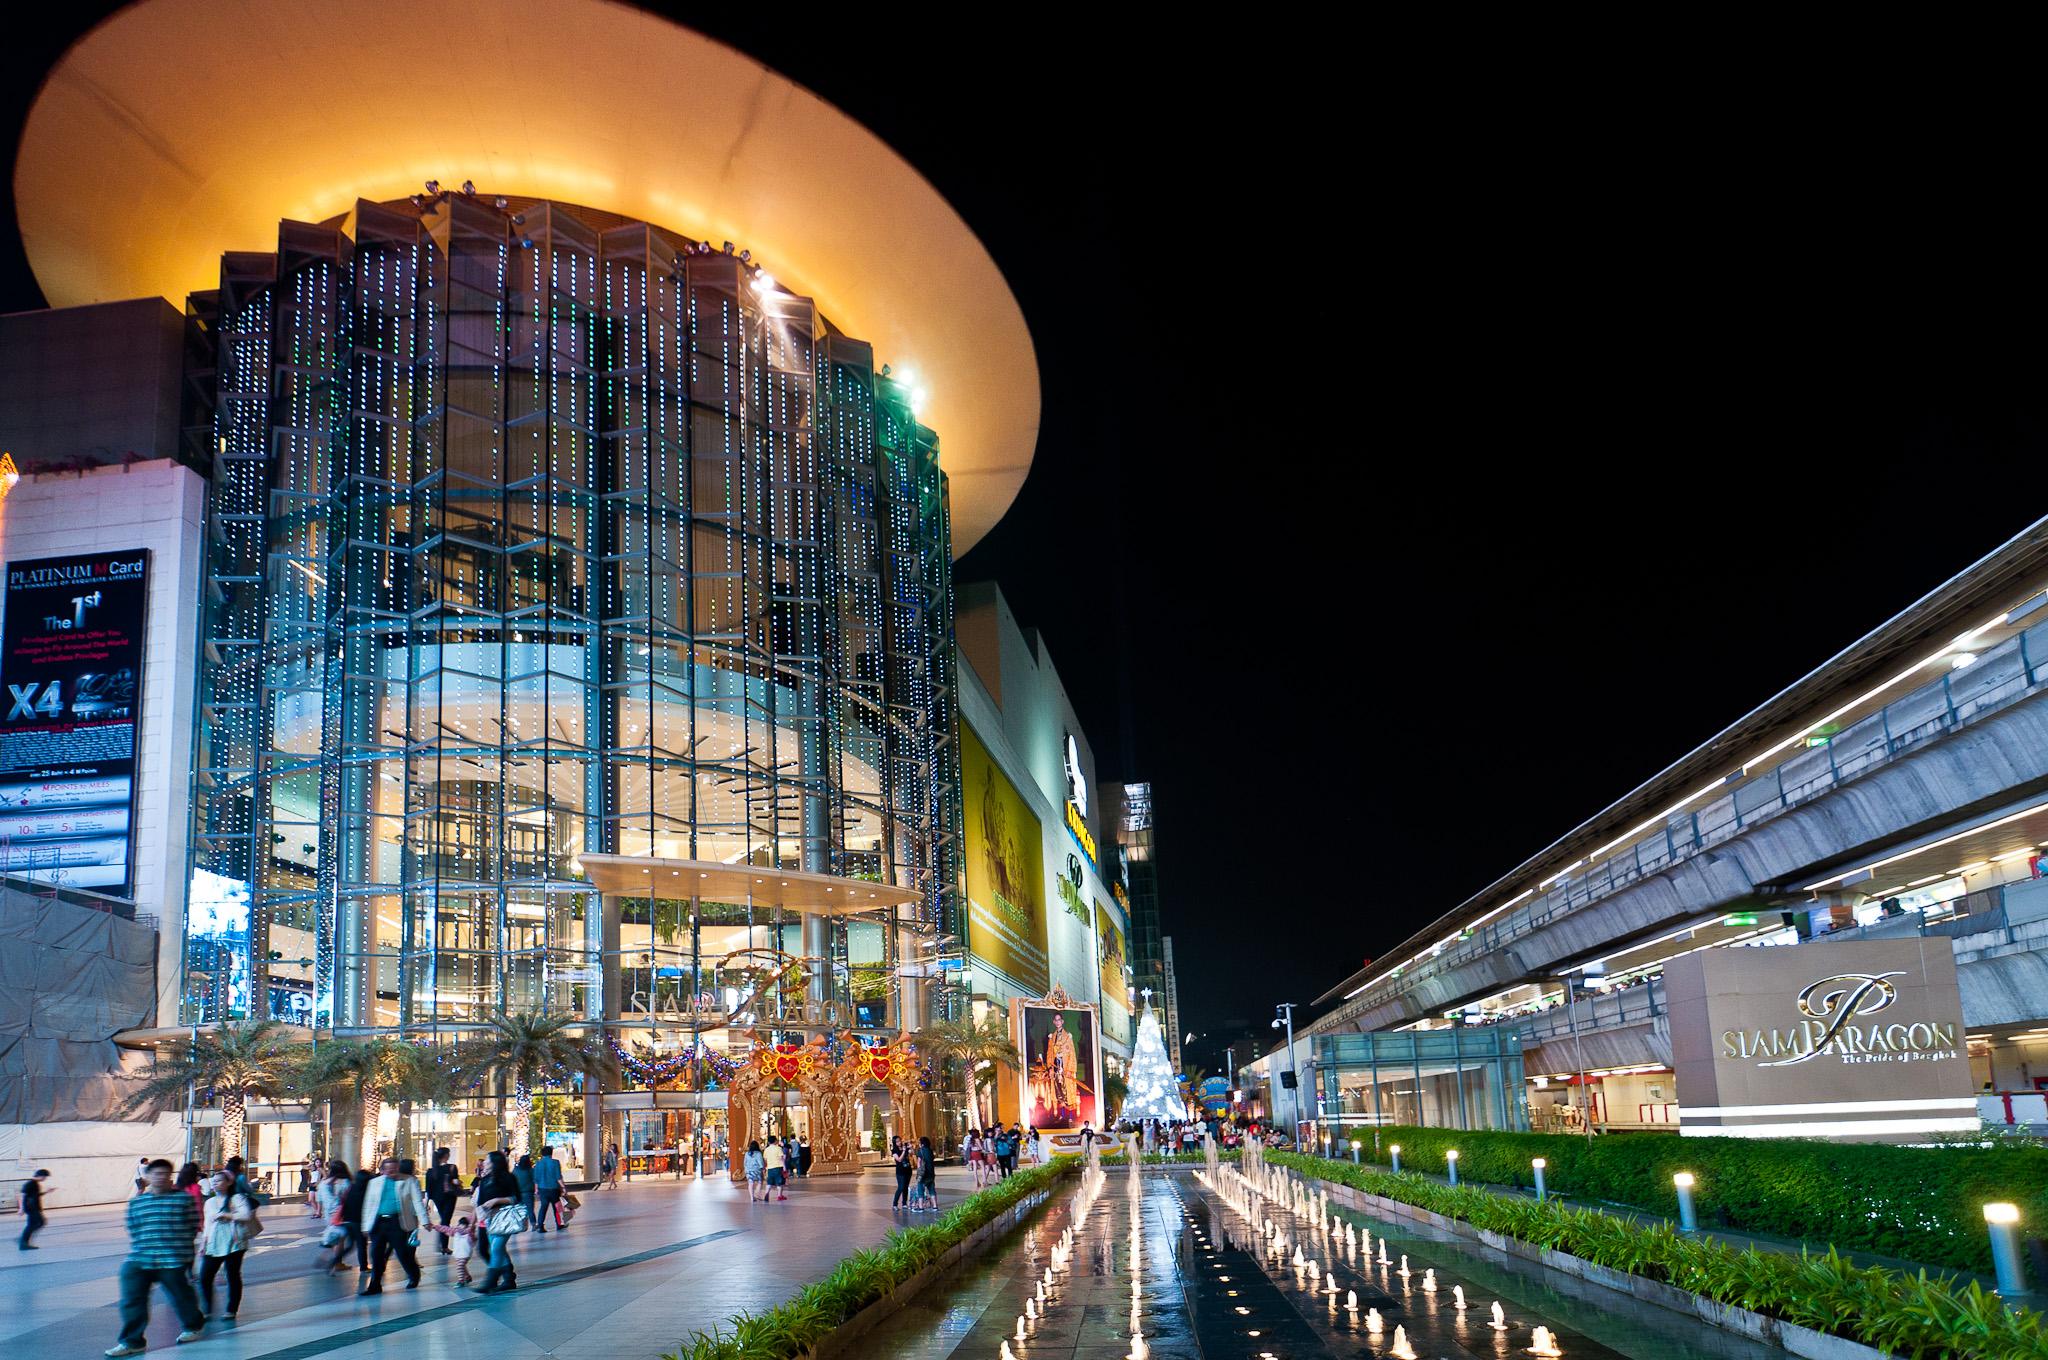 File:Thailand Bangkok SiamParagon Night.jpg - Wikimedia Commons